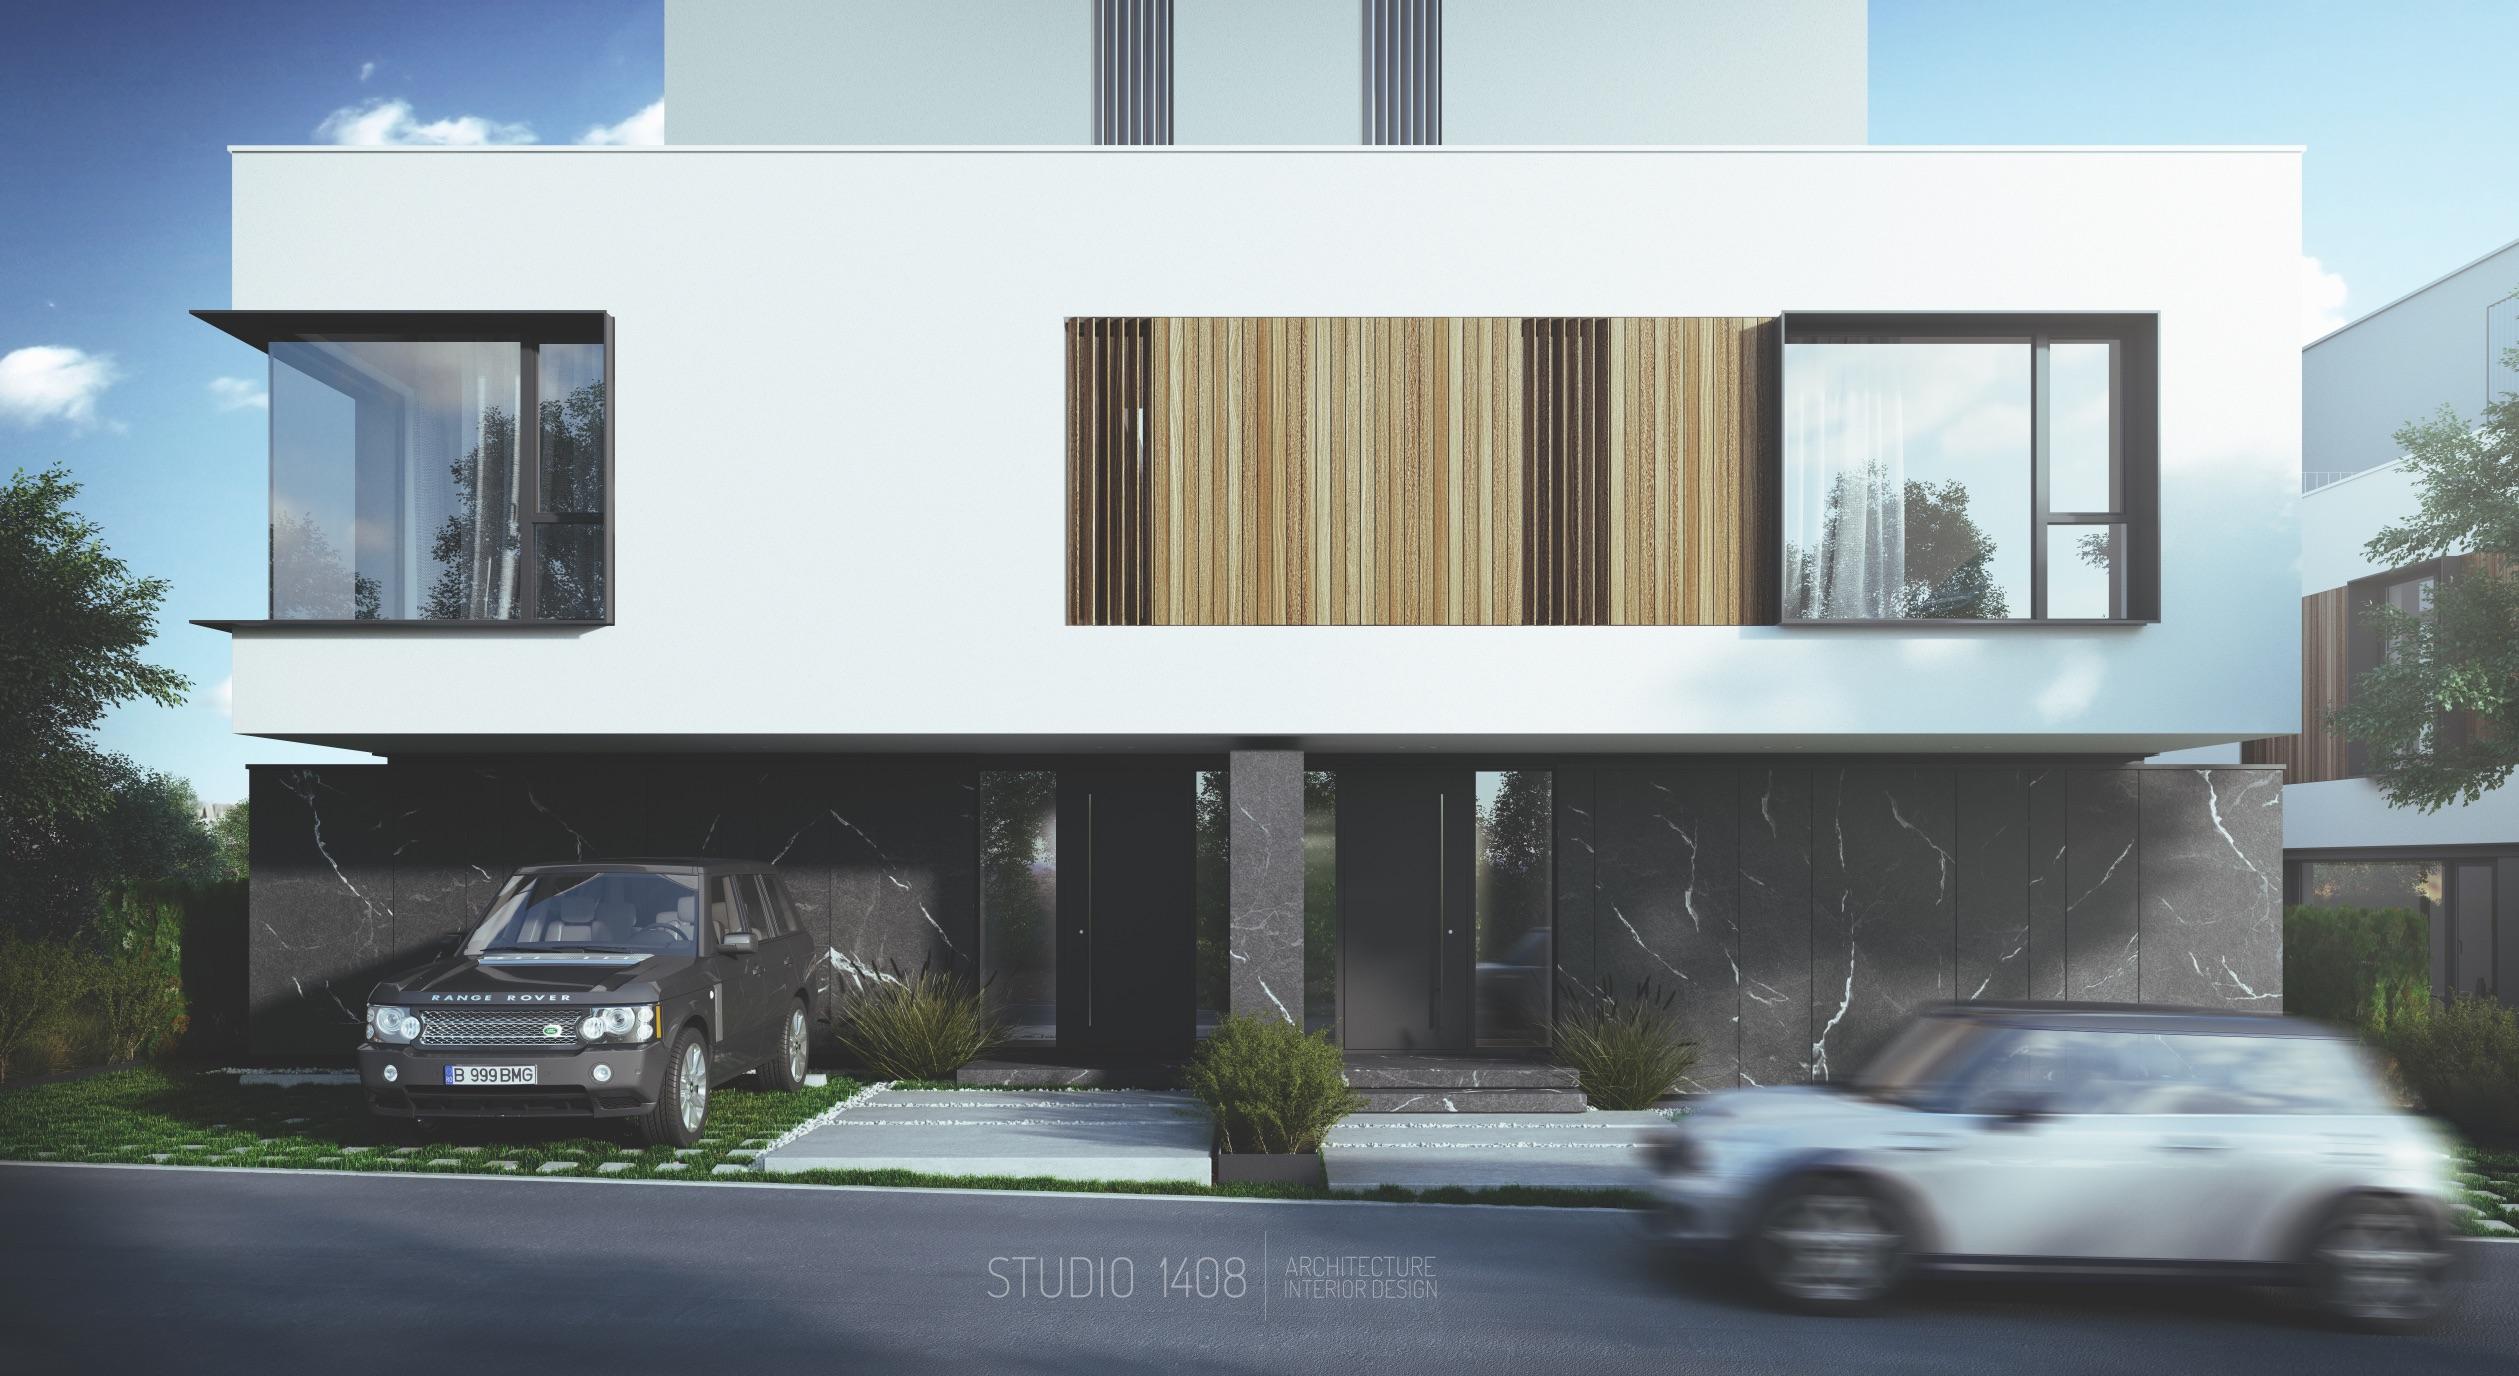 1_29 Residence_Studio 1408_Inspirationist